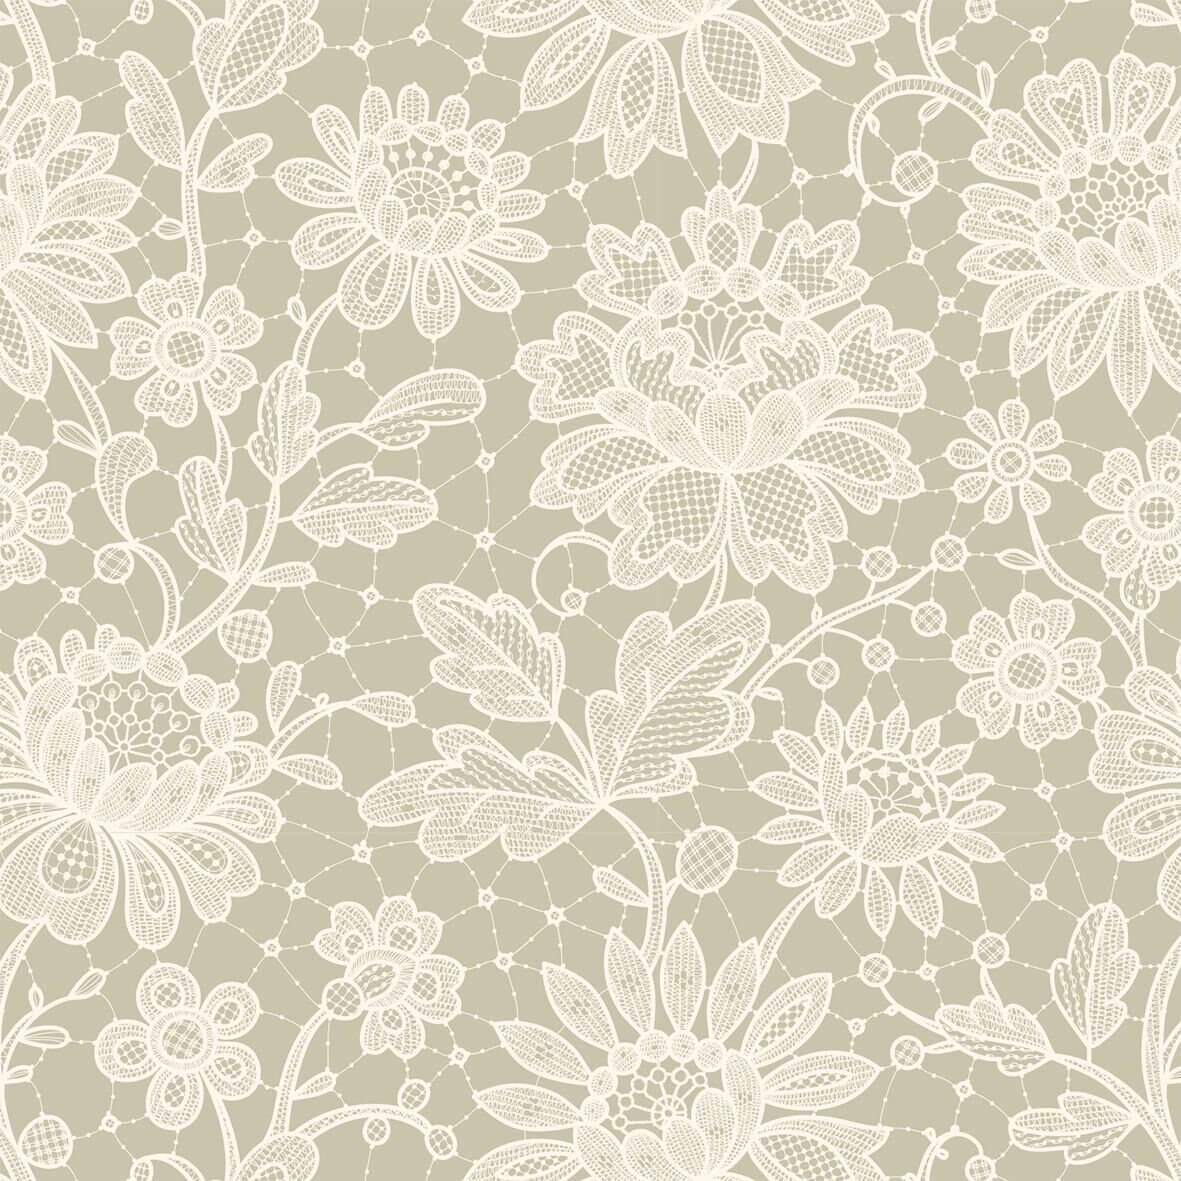 Duchesse Lace Ivory Decorative A3 Paper - Zoom